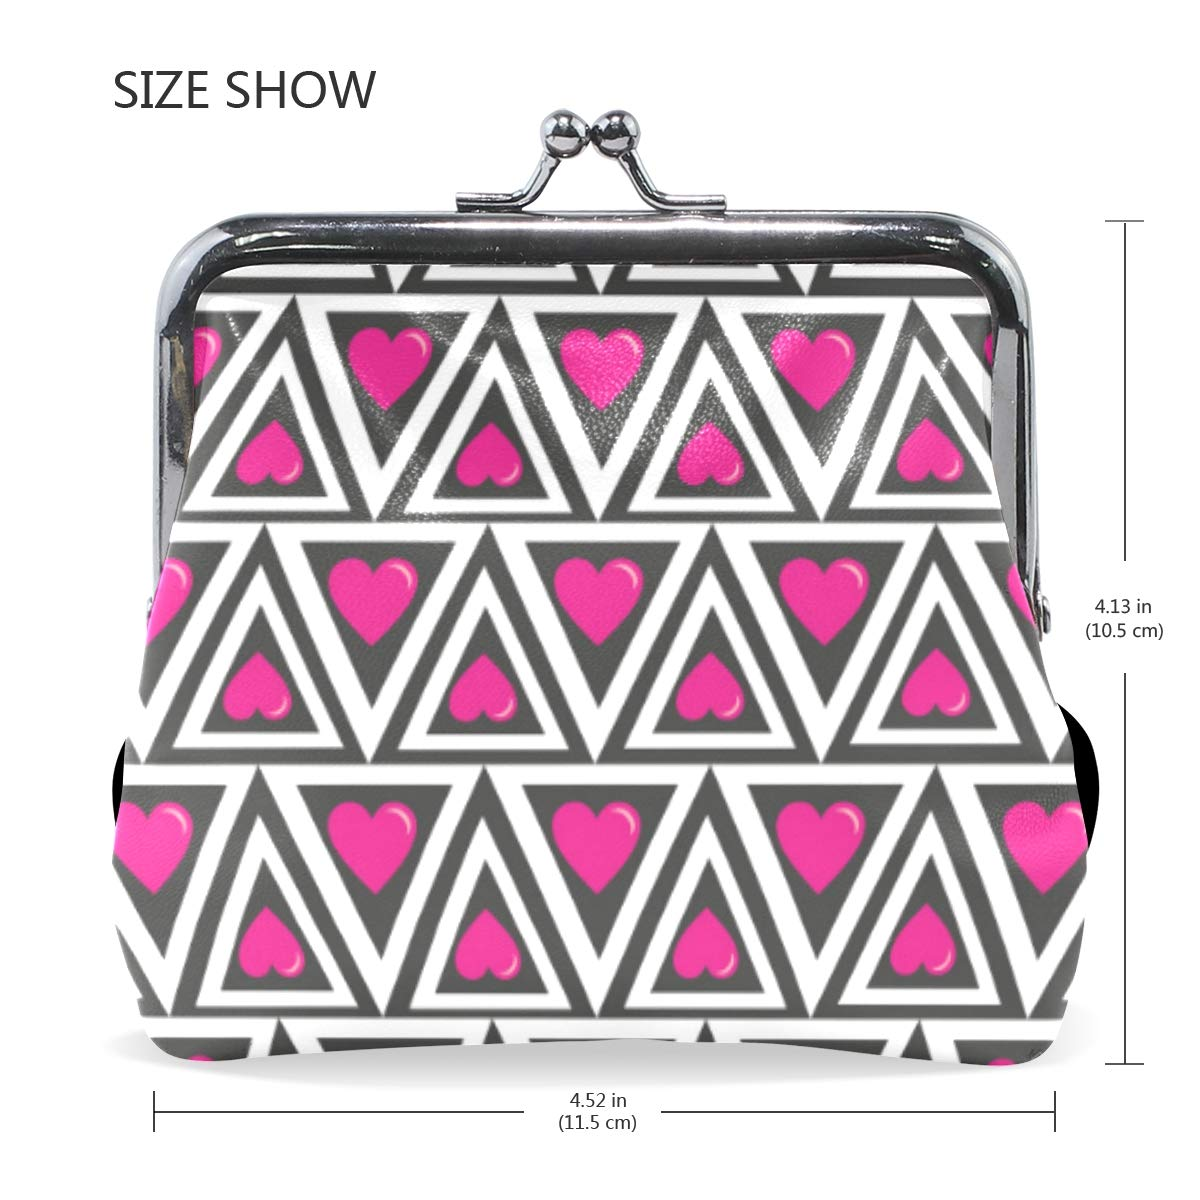 Fashion Womens Coin Purse Geometric Triangles Hearts Vintage Pouch Mini Purse Wallets